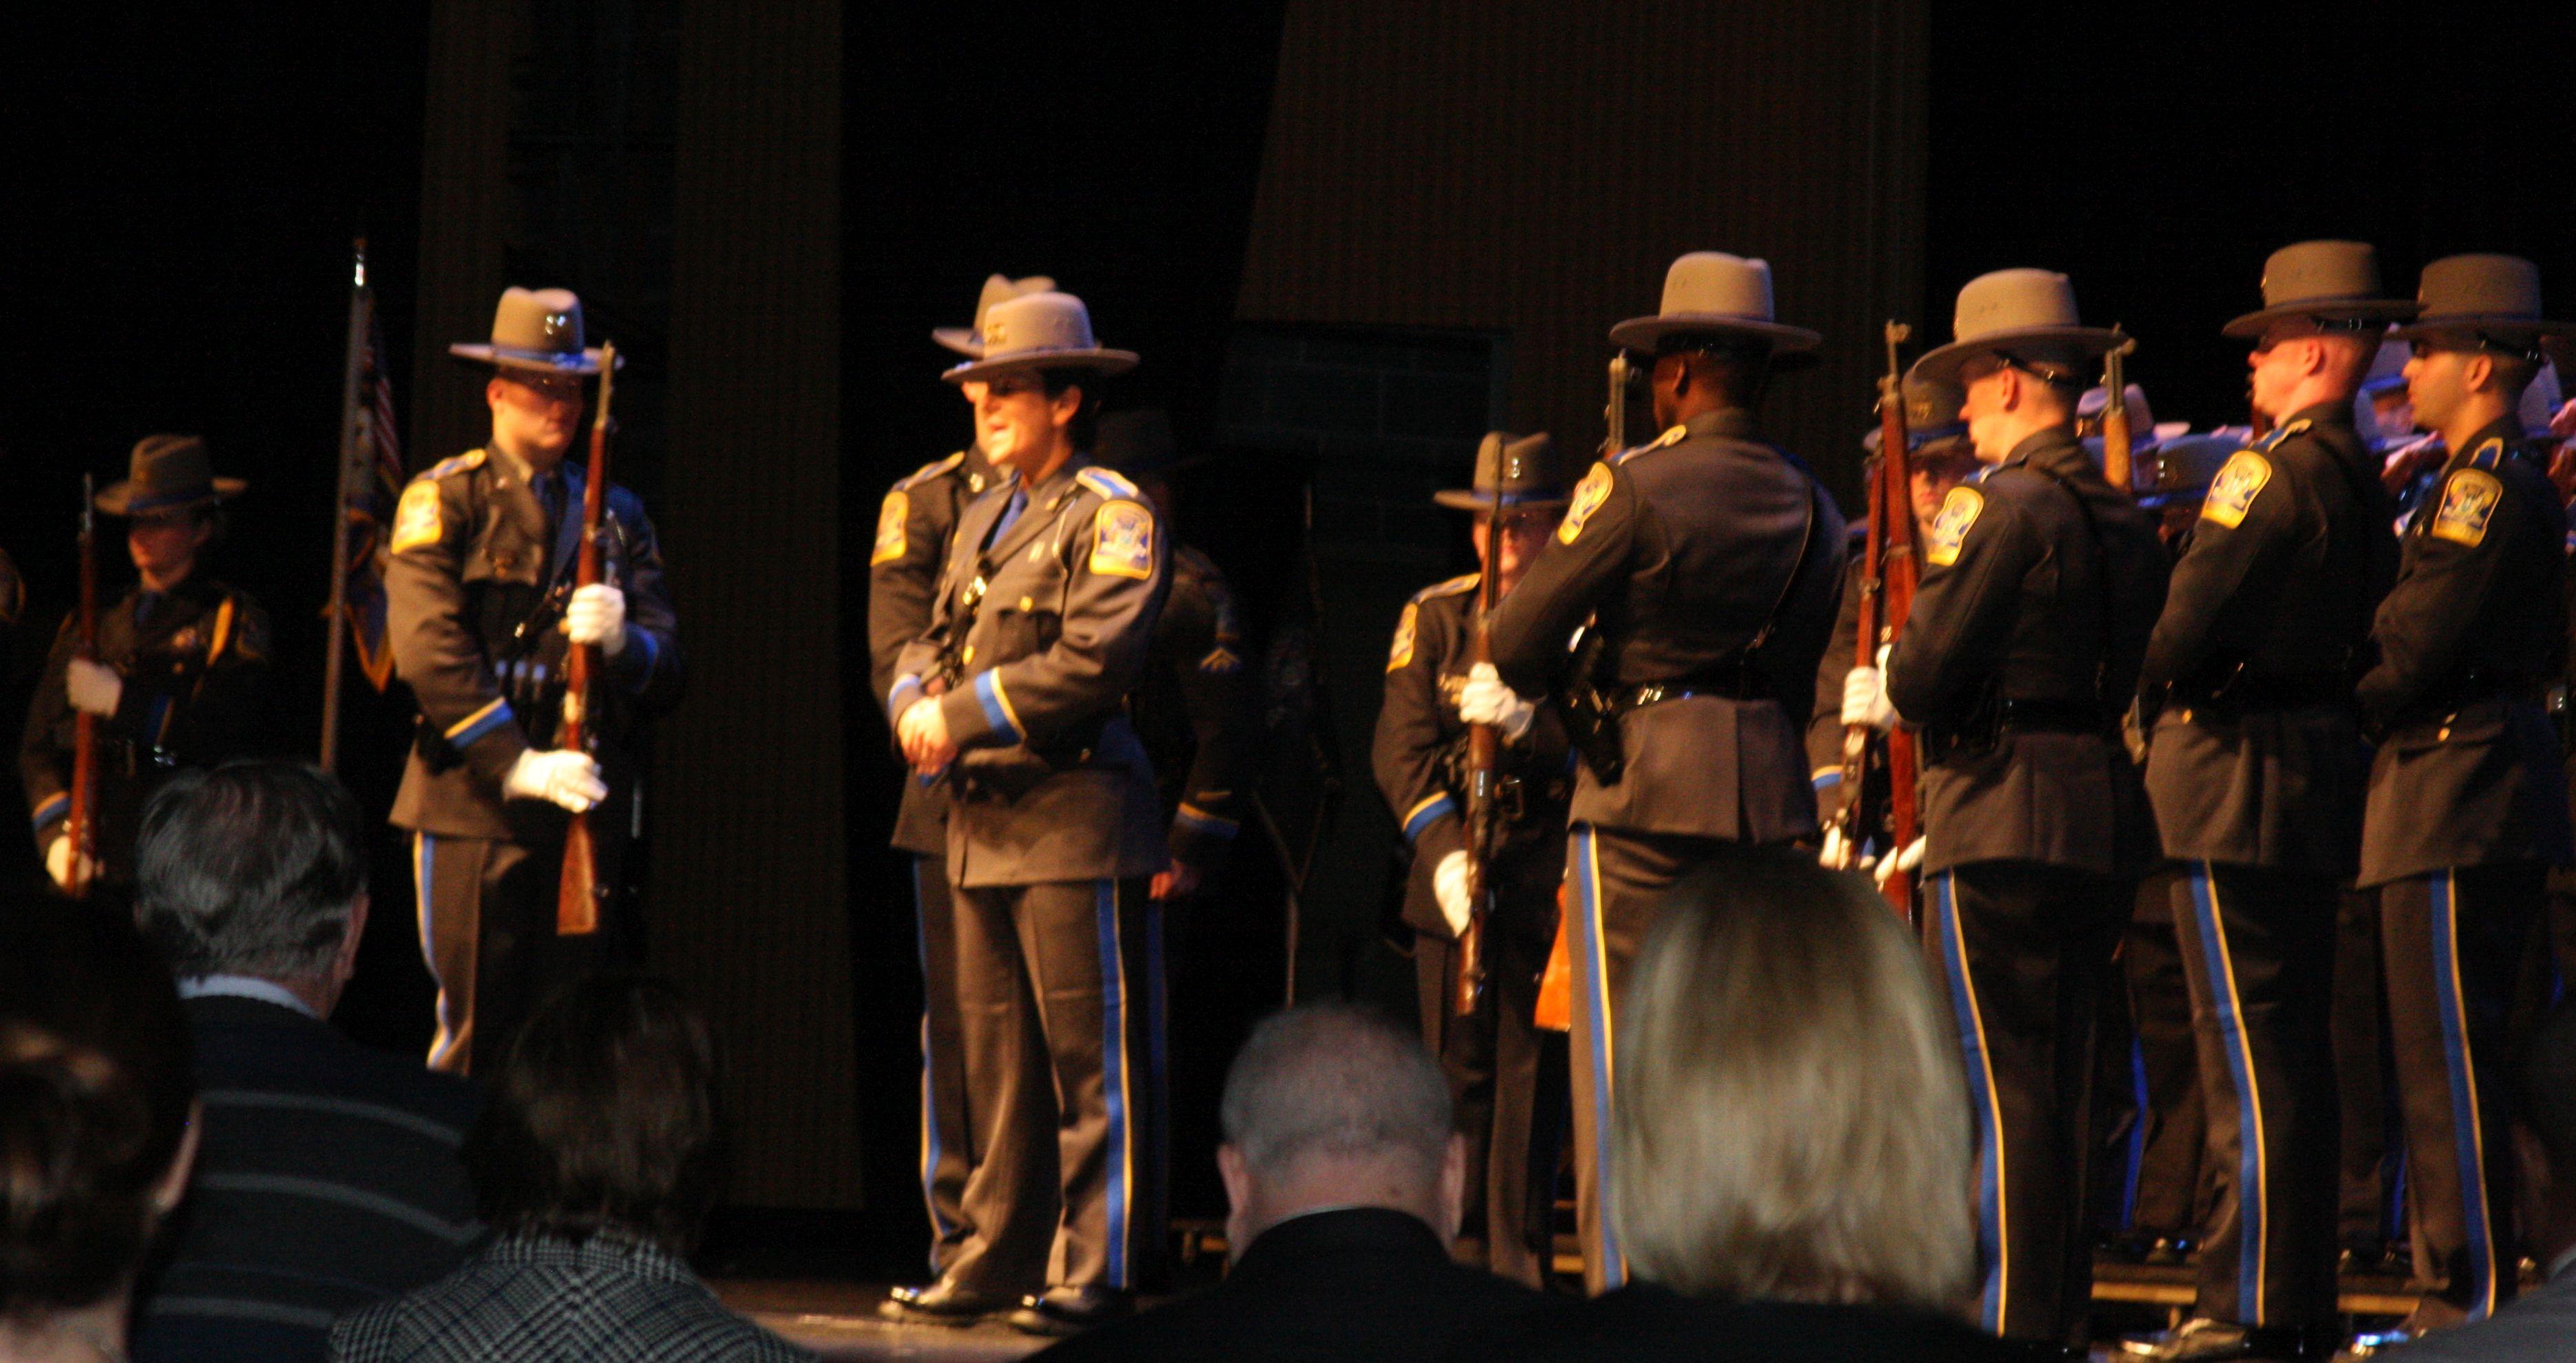 Police Academy - TomBarat - Friendly - PhotoBlog